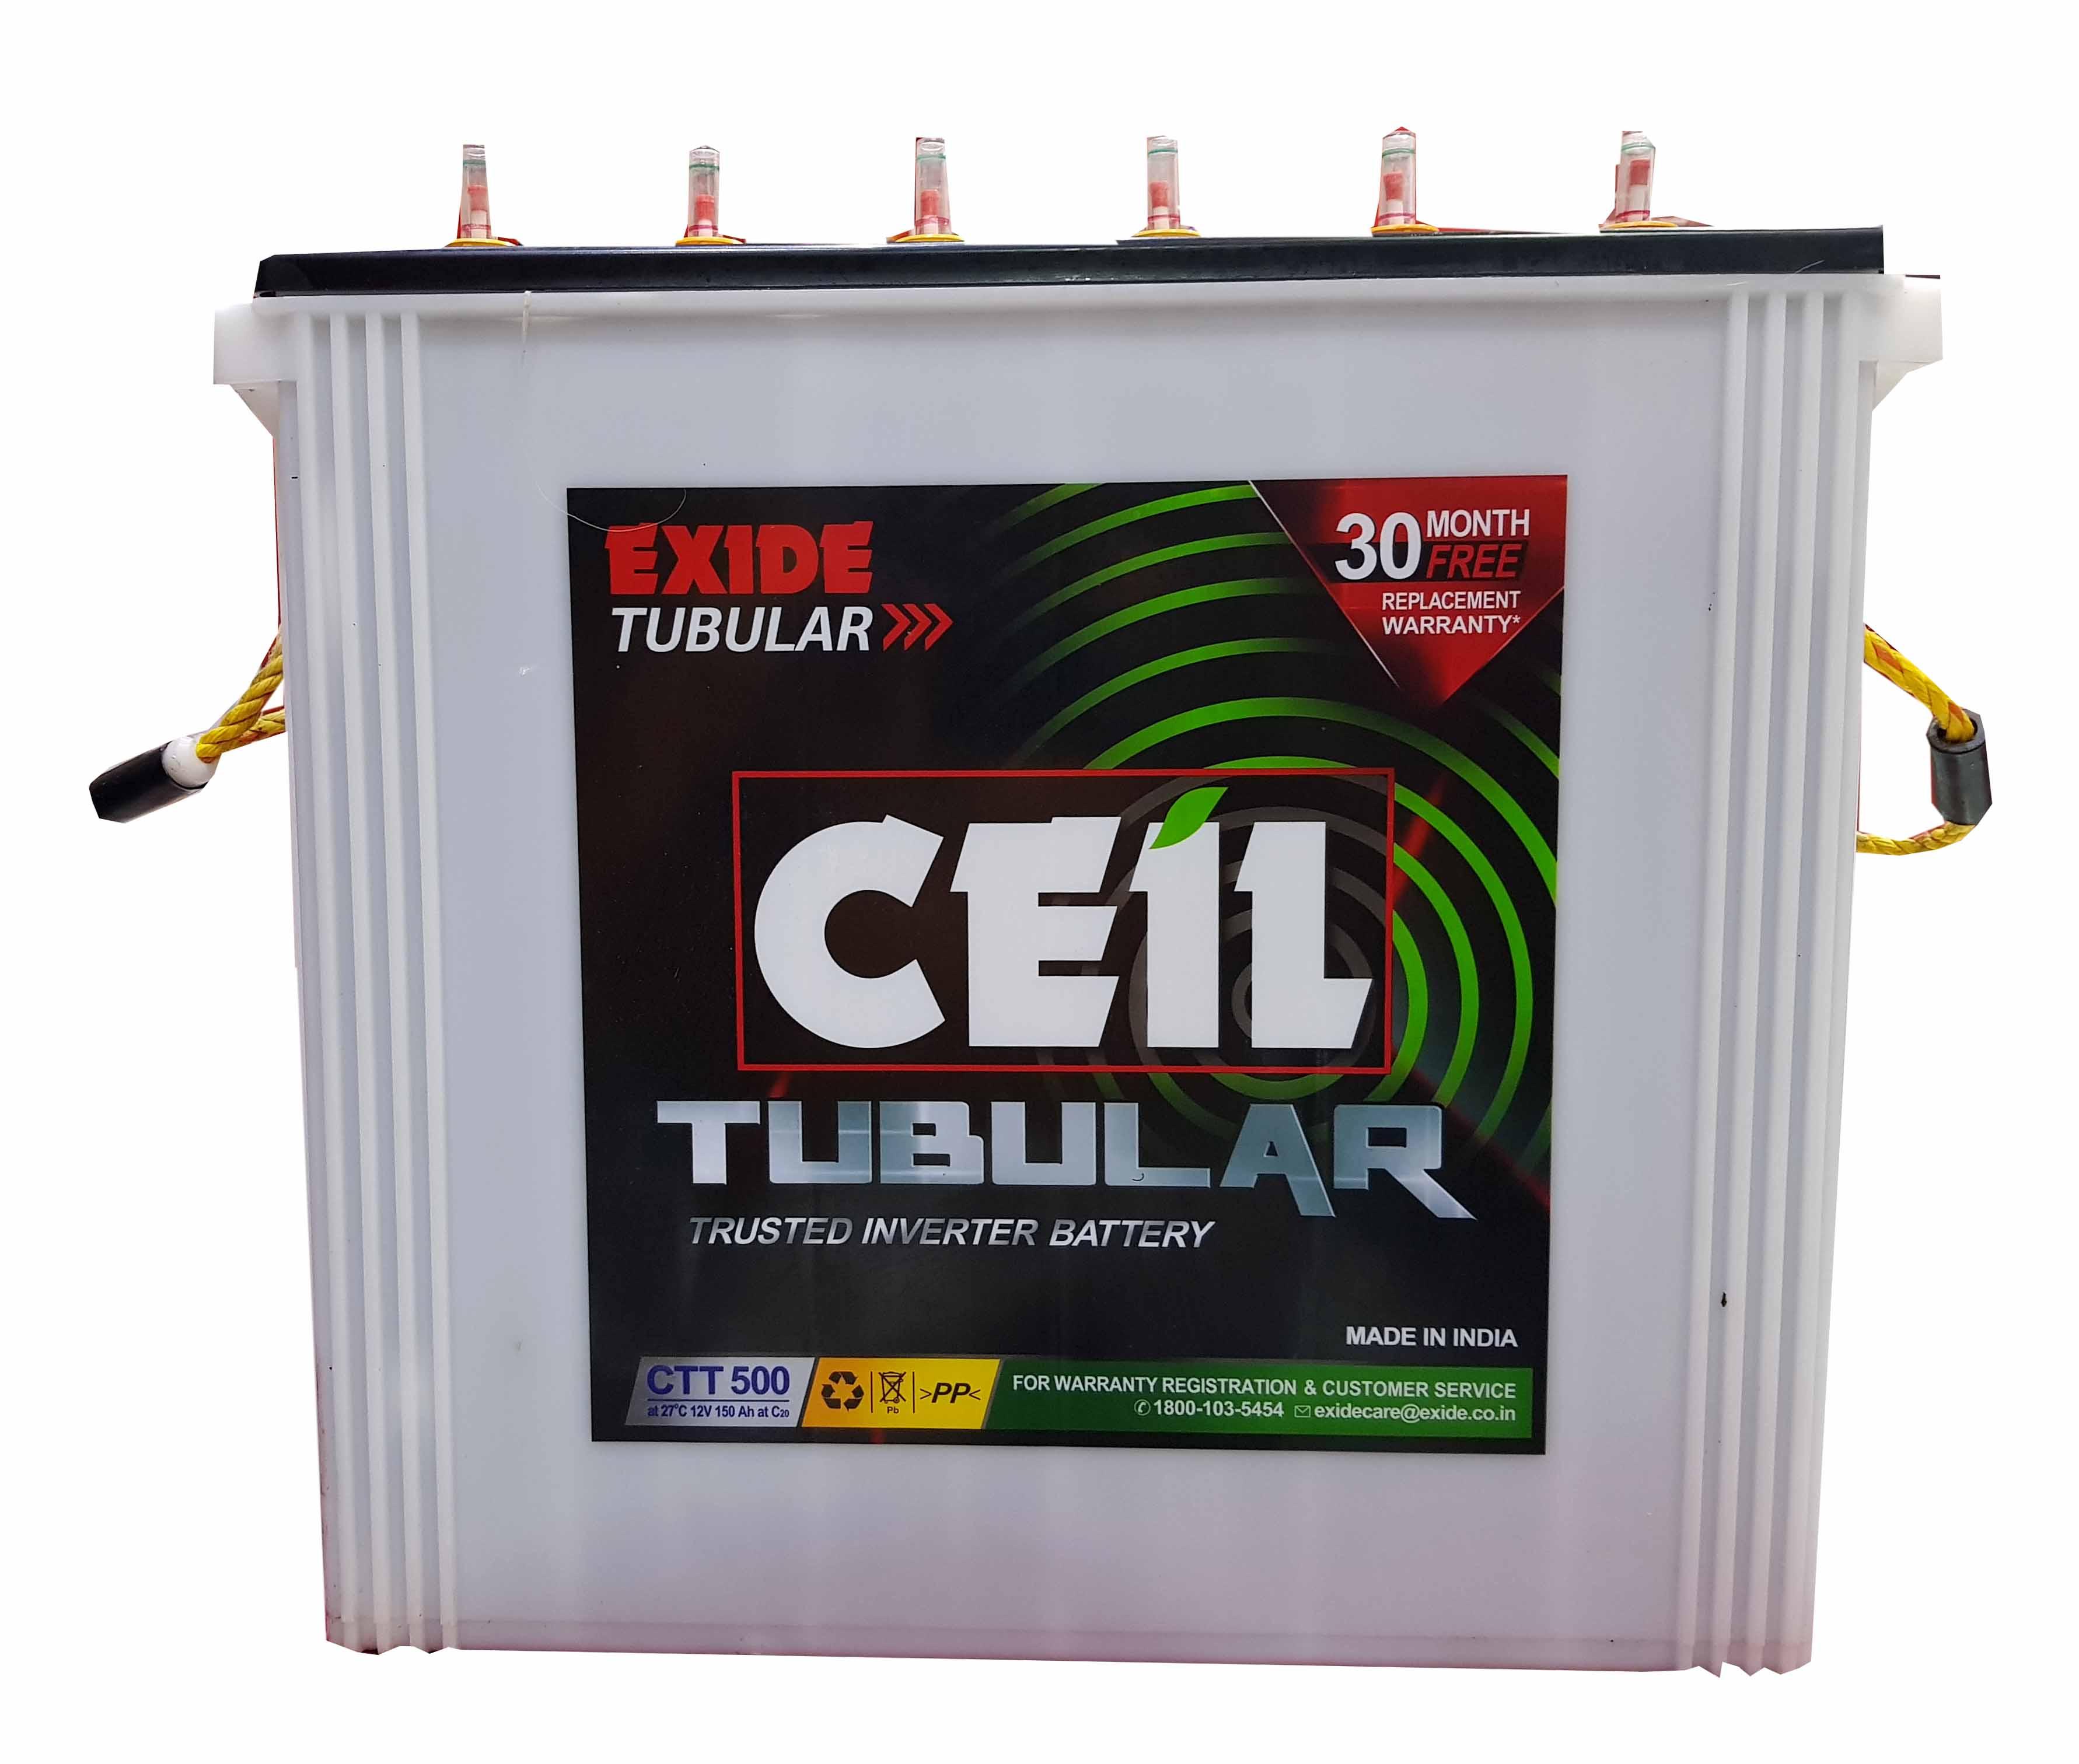 exide ceil tubular ctt500 price